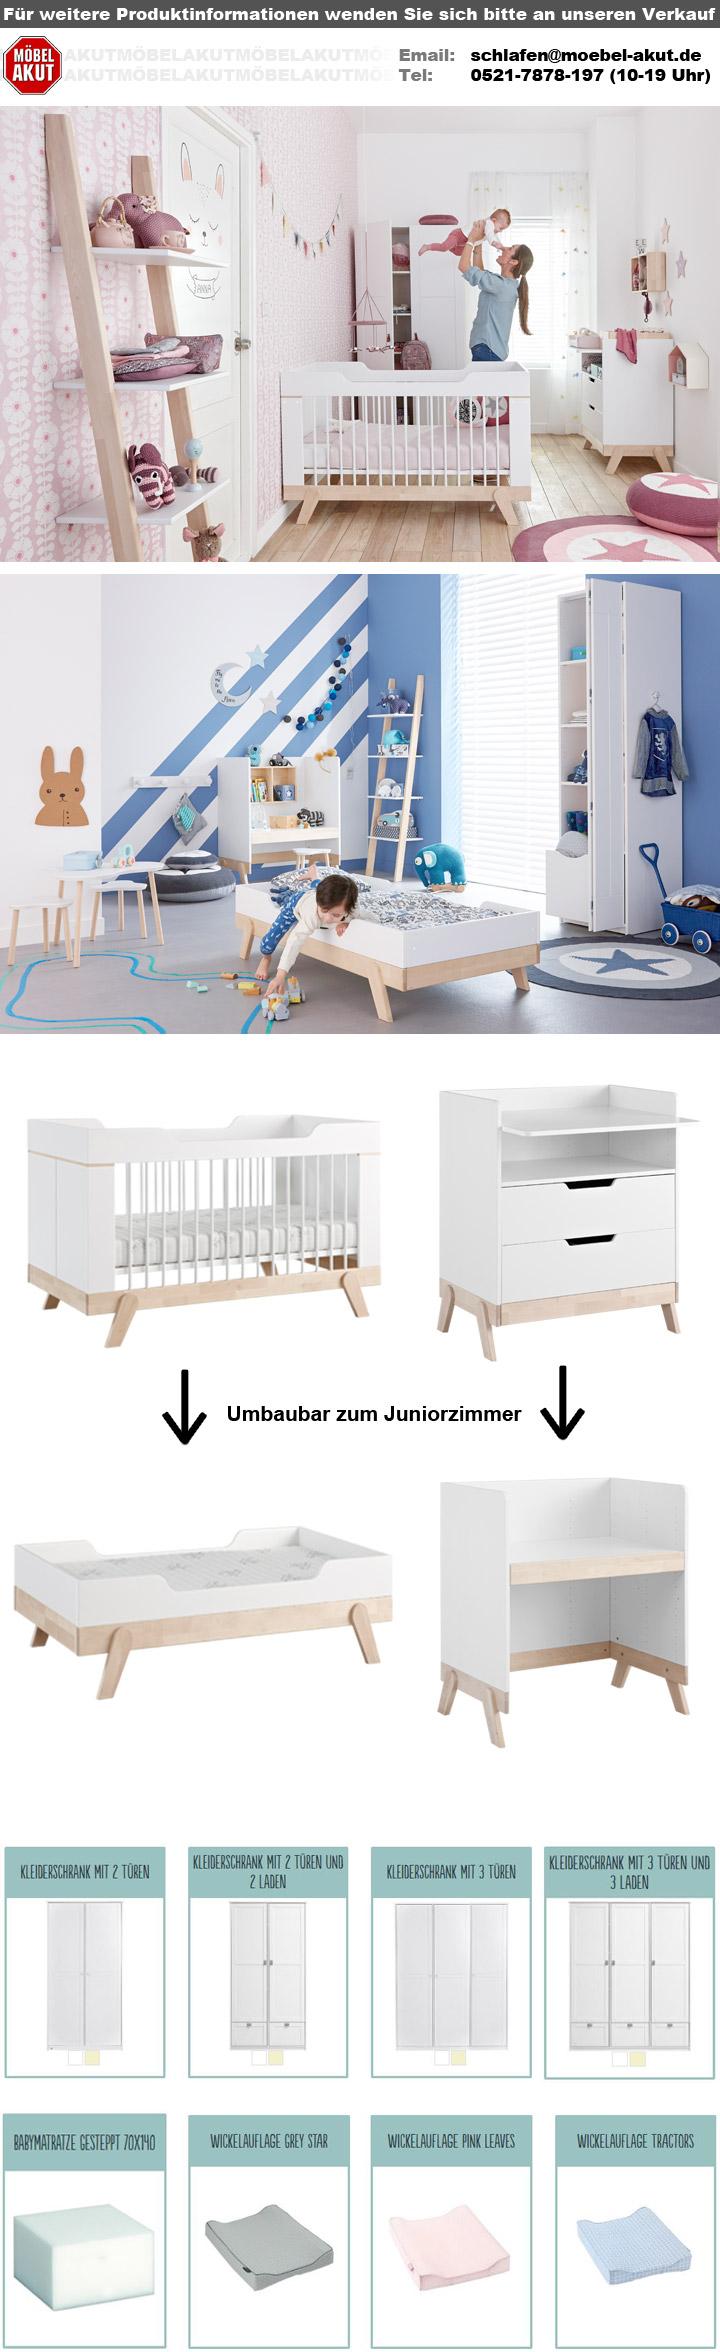 babybett life time gitterbett in birke massiv und wei umbaubar. Black Bedroom Furniture Sets. Home Design Ideas